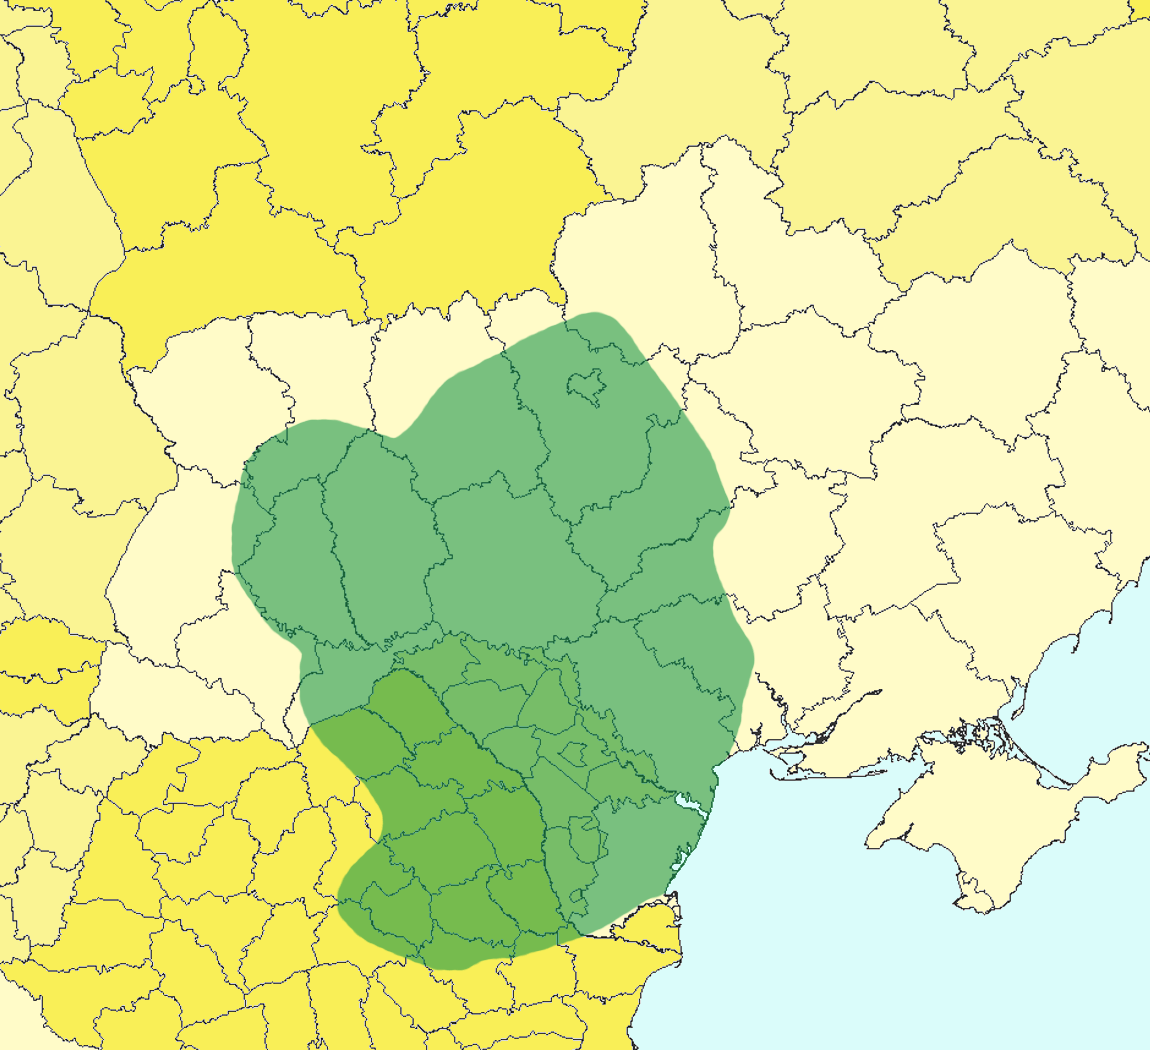 https://i1.wp.com/upload.wikimedia.org/wikipedia/commons/b/bc/Cucuteni-Tripol%27ye_Culture_Outline_Map.png